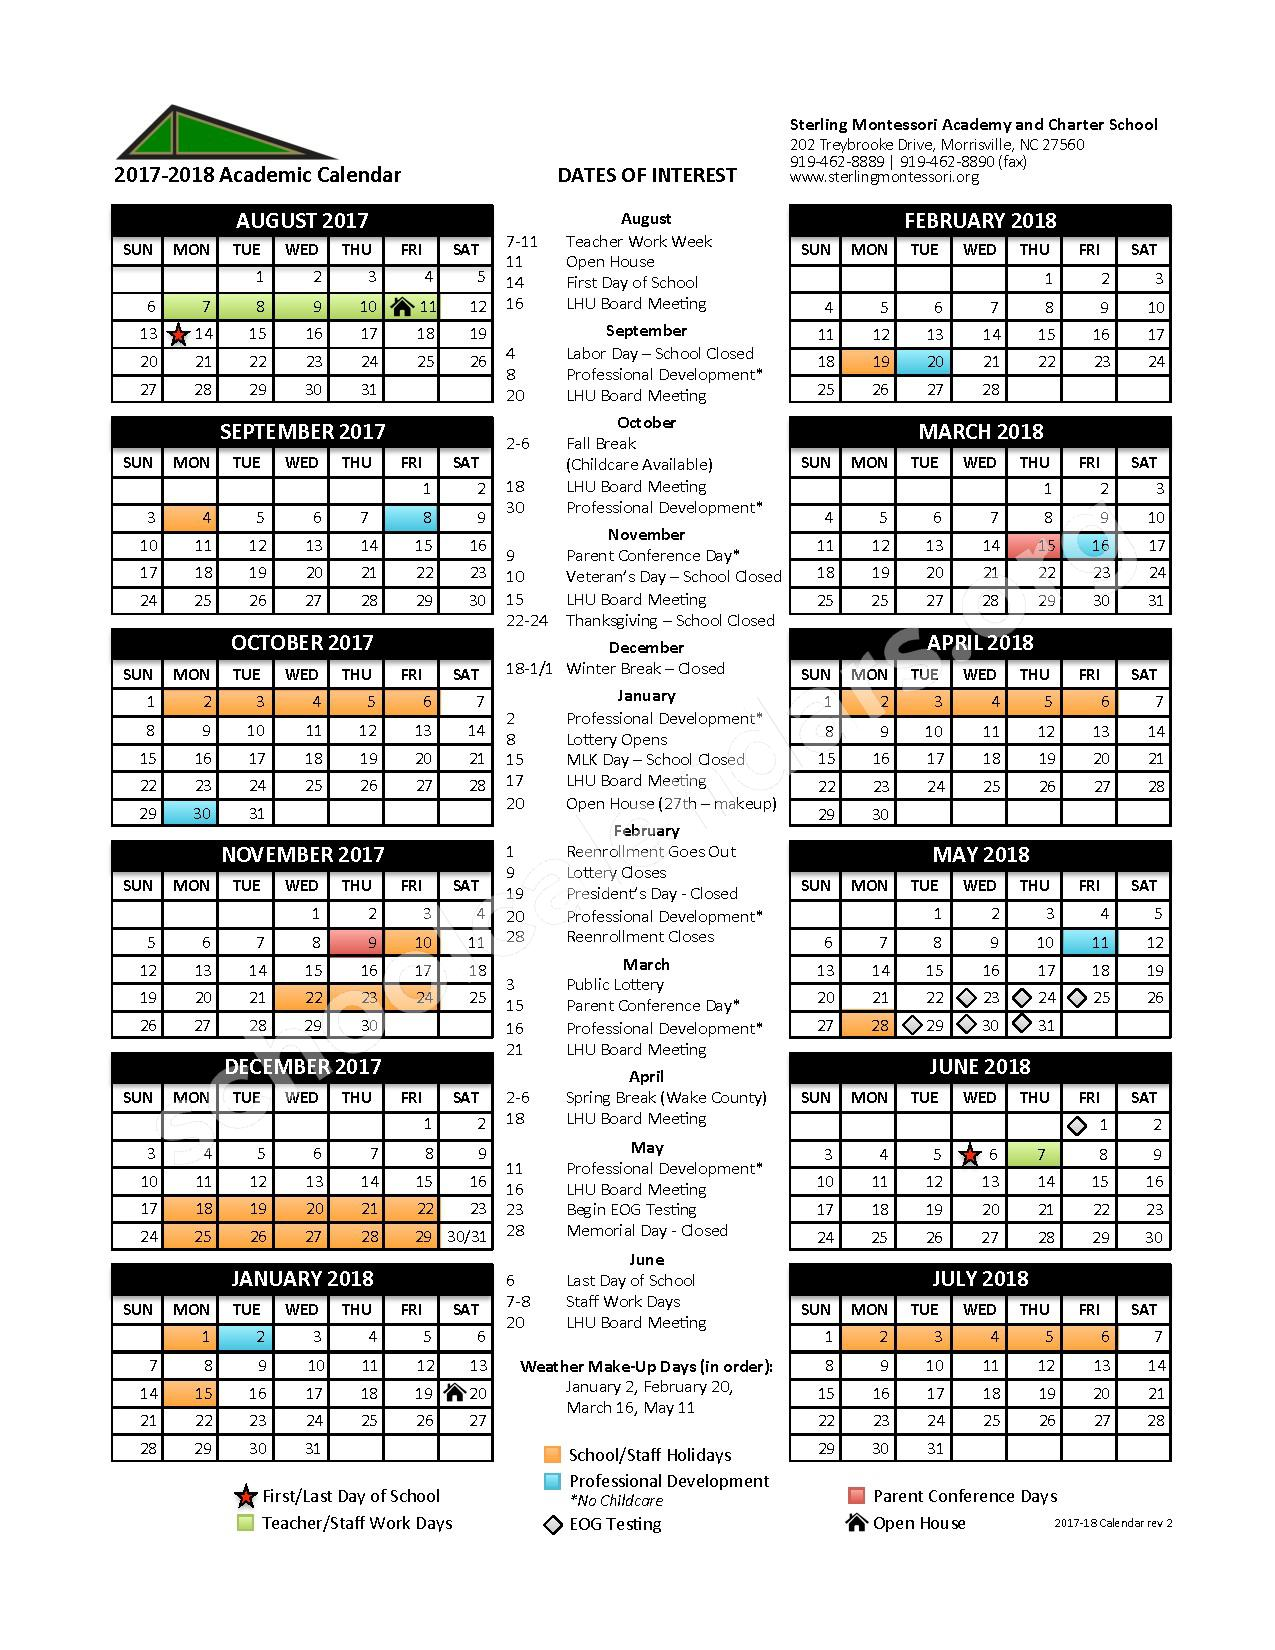 2017 - 2018 Academic Calendar – Sterling Montessori Academy – page 1